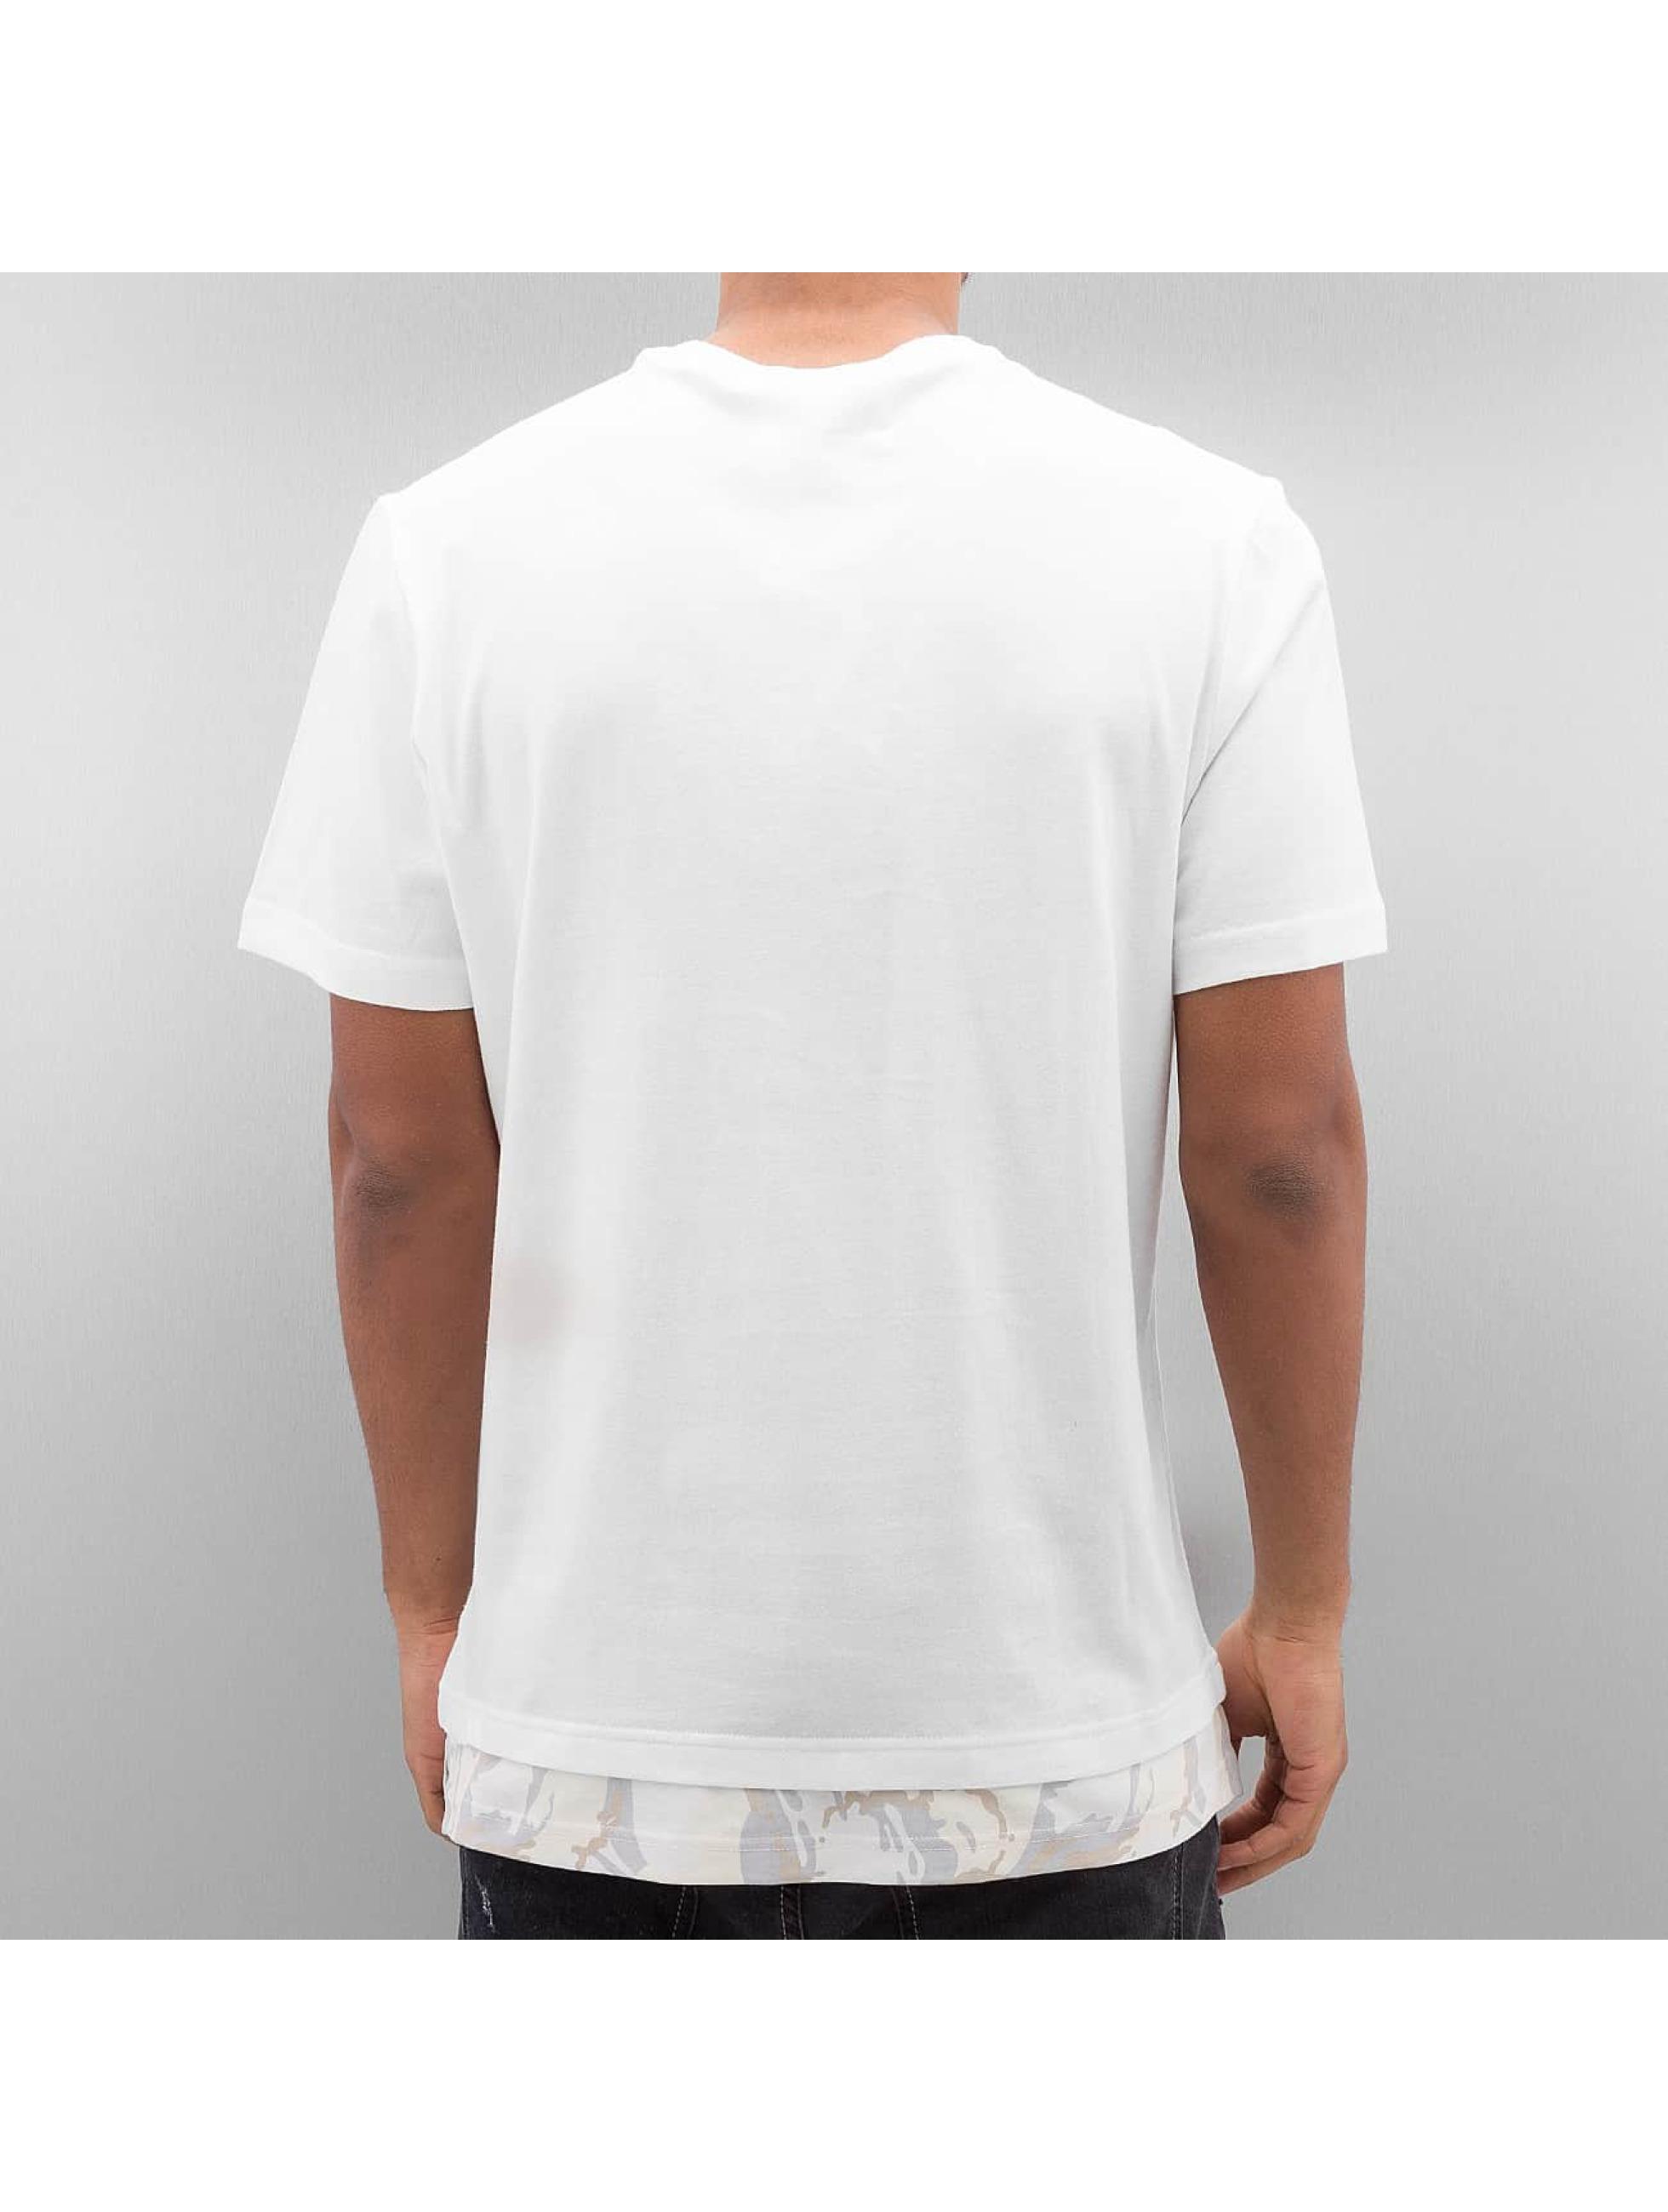 Reebok T-Shirt Layered white